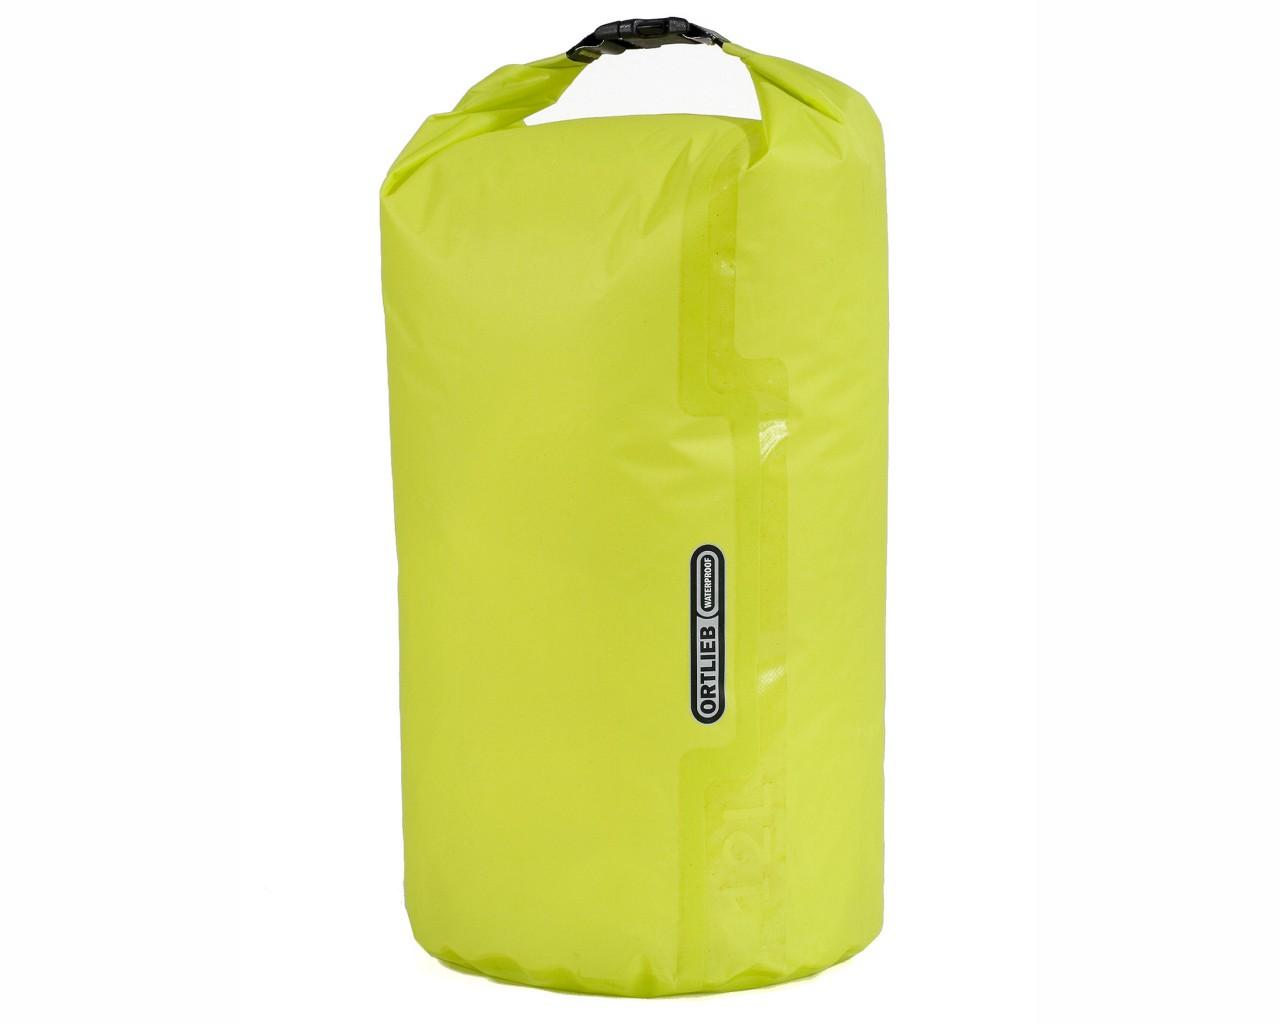 Ortlieb dry bag PS10 - 3 liter | light green